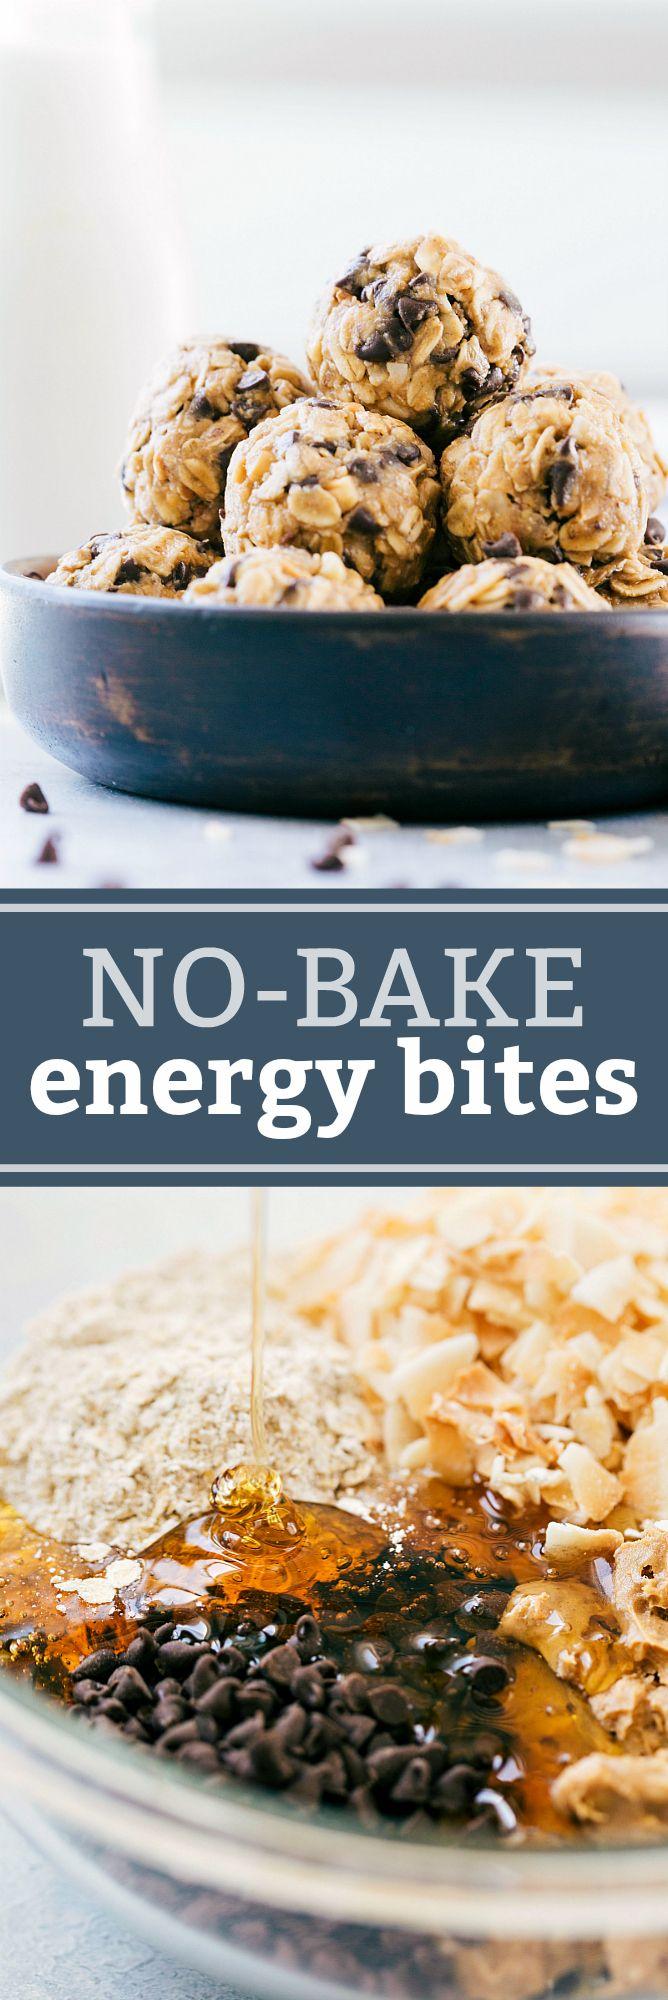 No Bake Energy Bites | Chelsea's Messy Apron